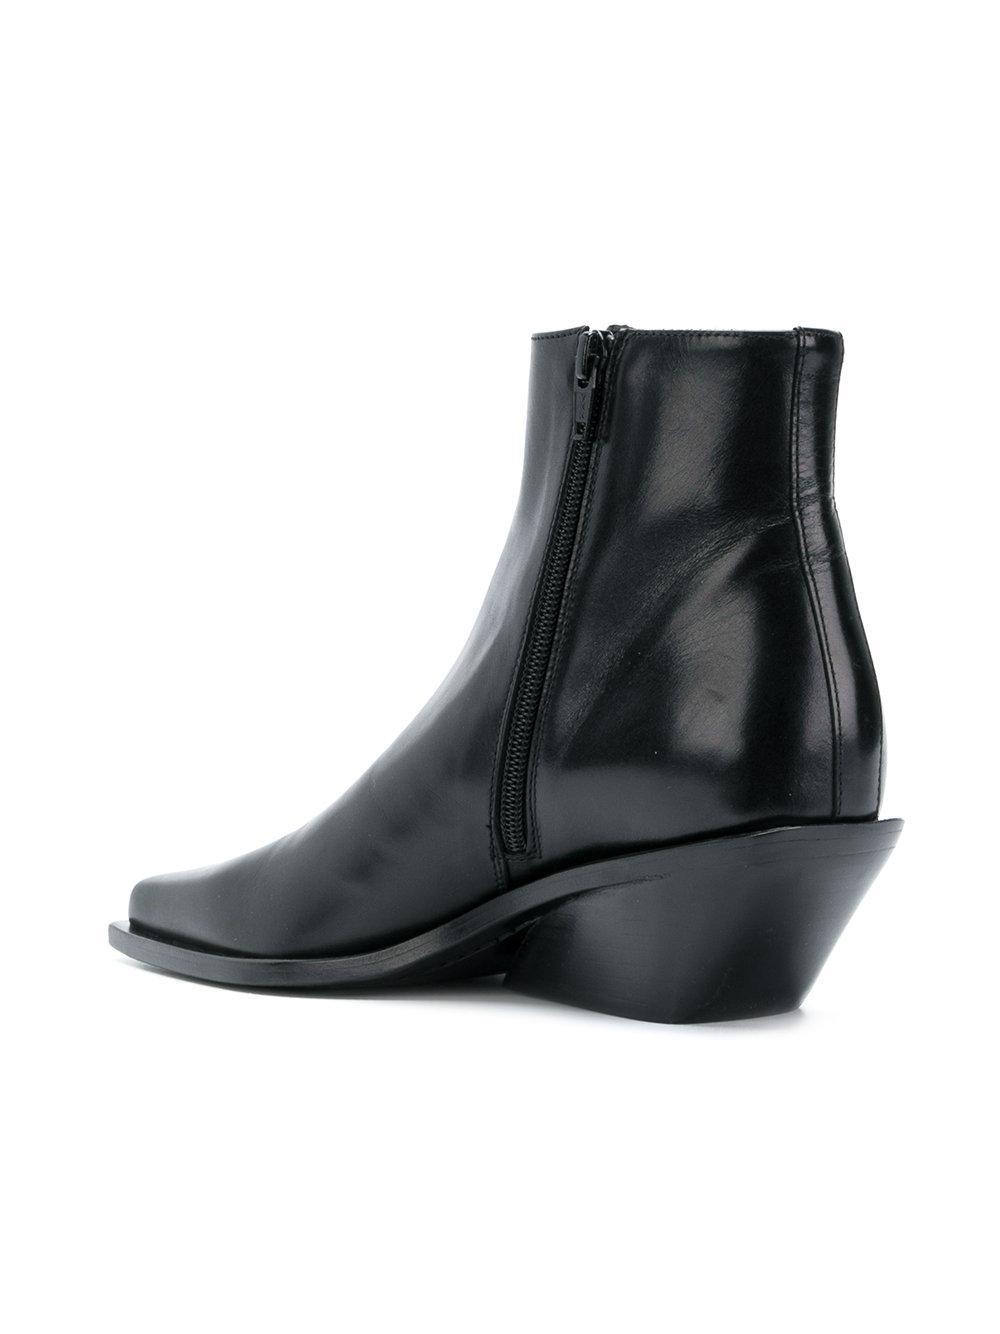 Ann Demeulemeester Leather Asymmetric Heel Boot in Black